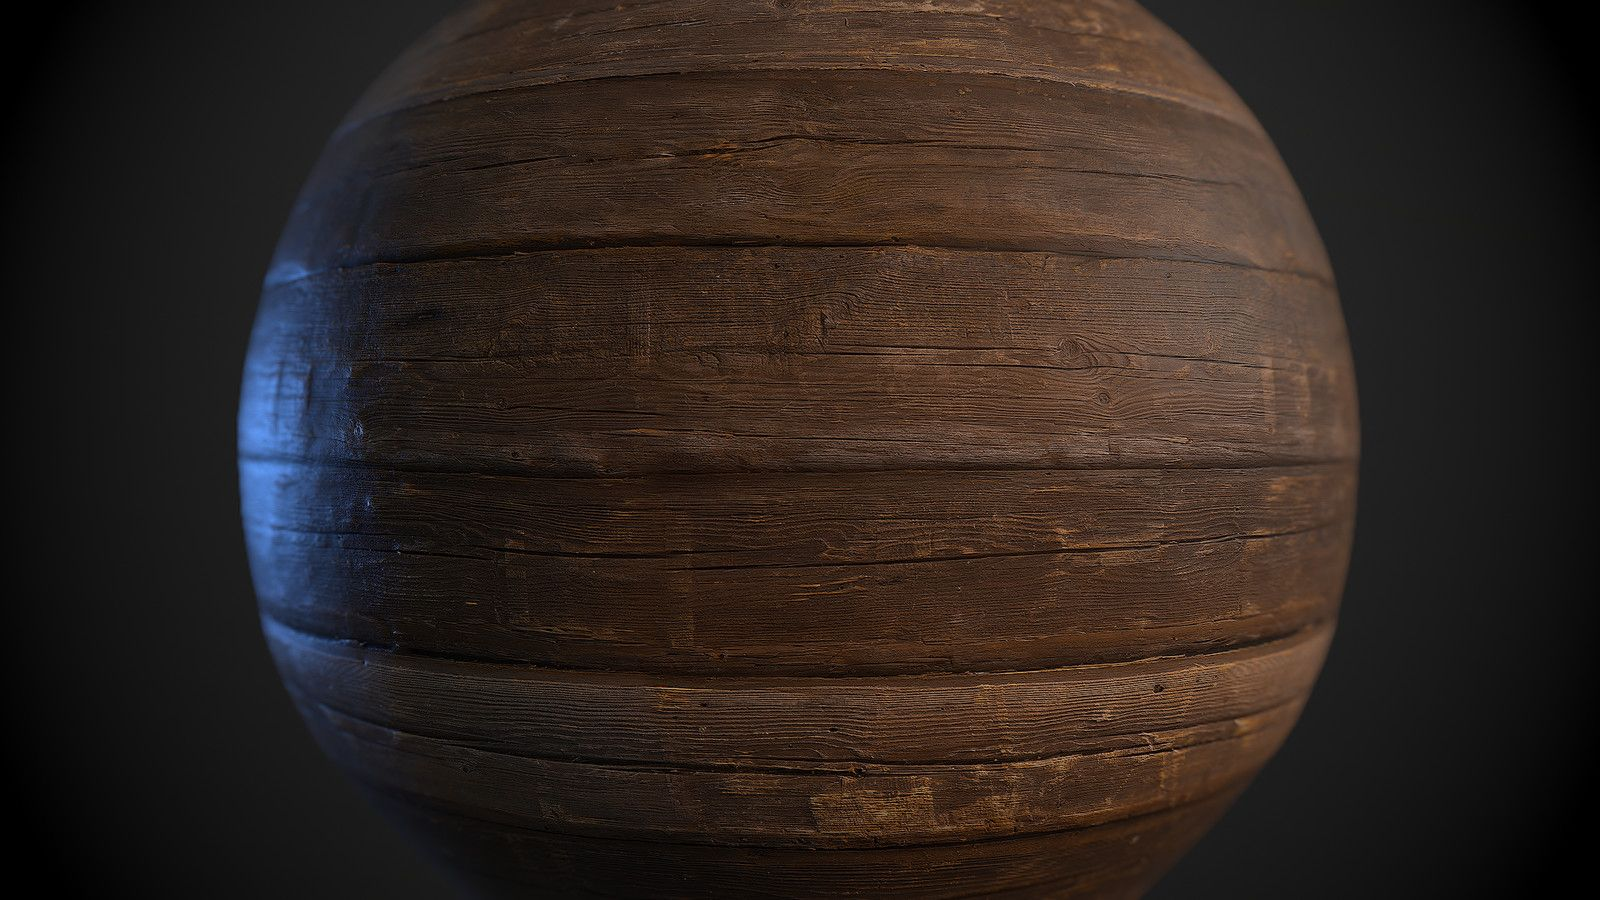 Pin by Tyler King on Blender Wooden planks, Wooden, Plank